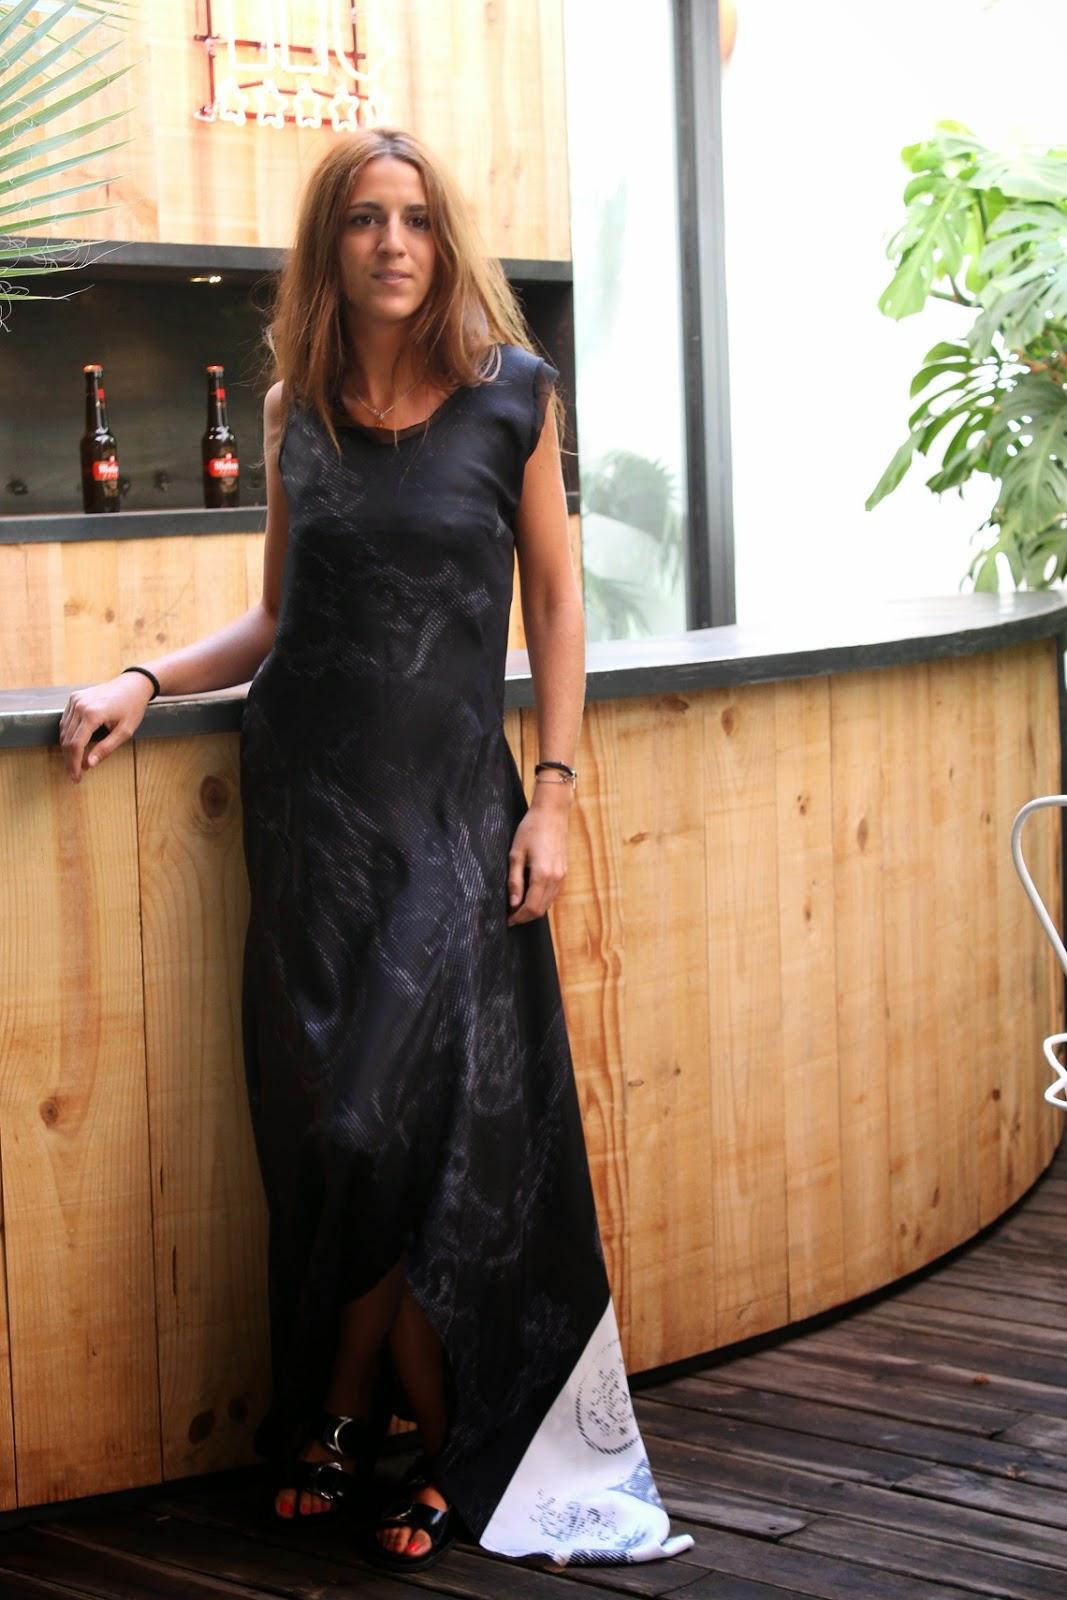 Yaëll Barnatán Benarroch, Colección, Diseño, Fashion Style, Leather, Street Style, Life Style